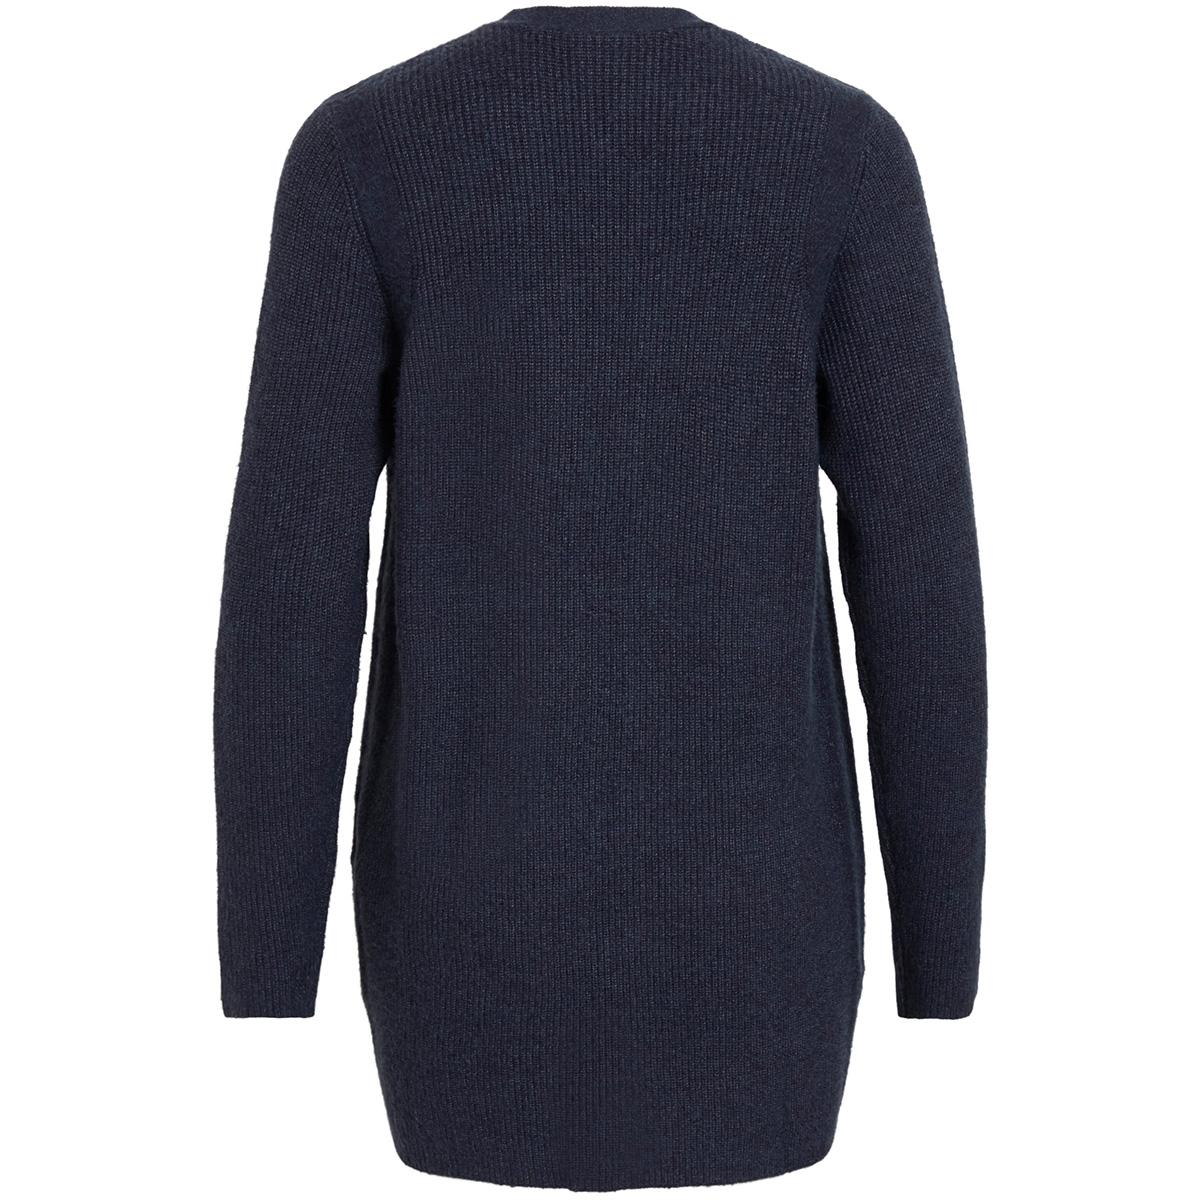 viril l/s  open knit rib cardigan 14051977 vila vest total eclipse/melange